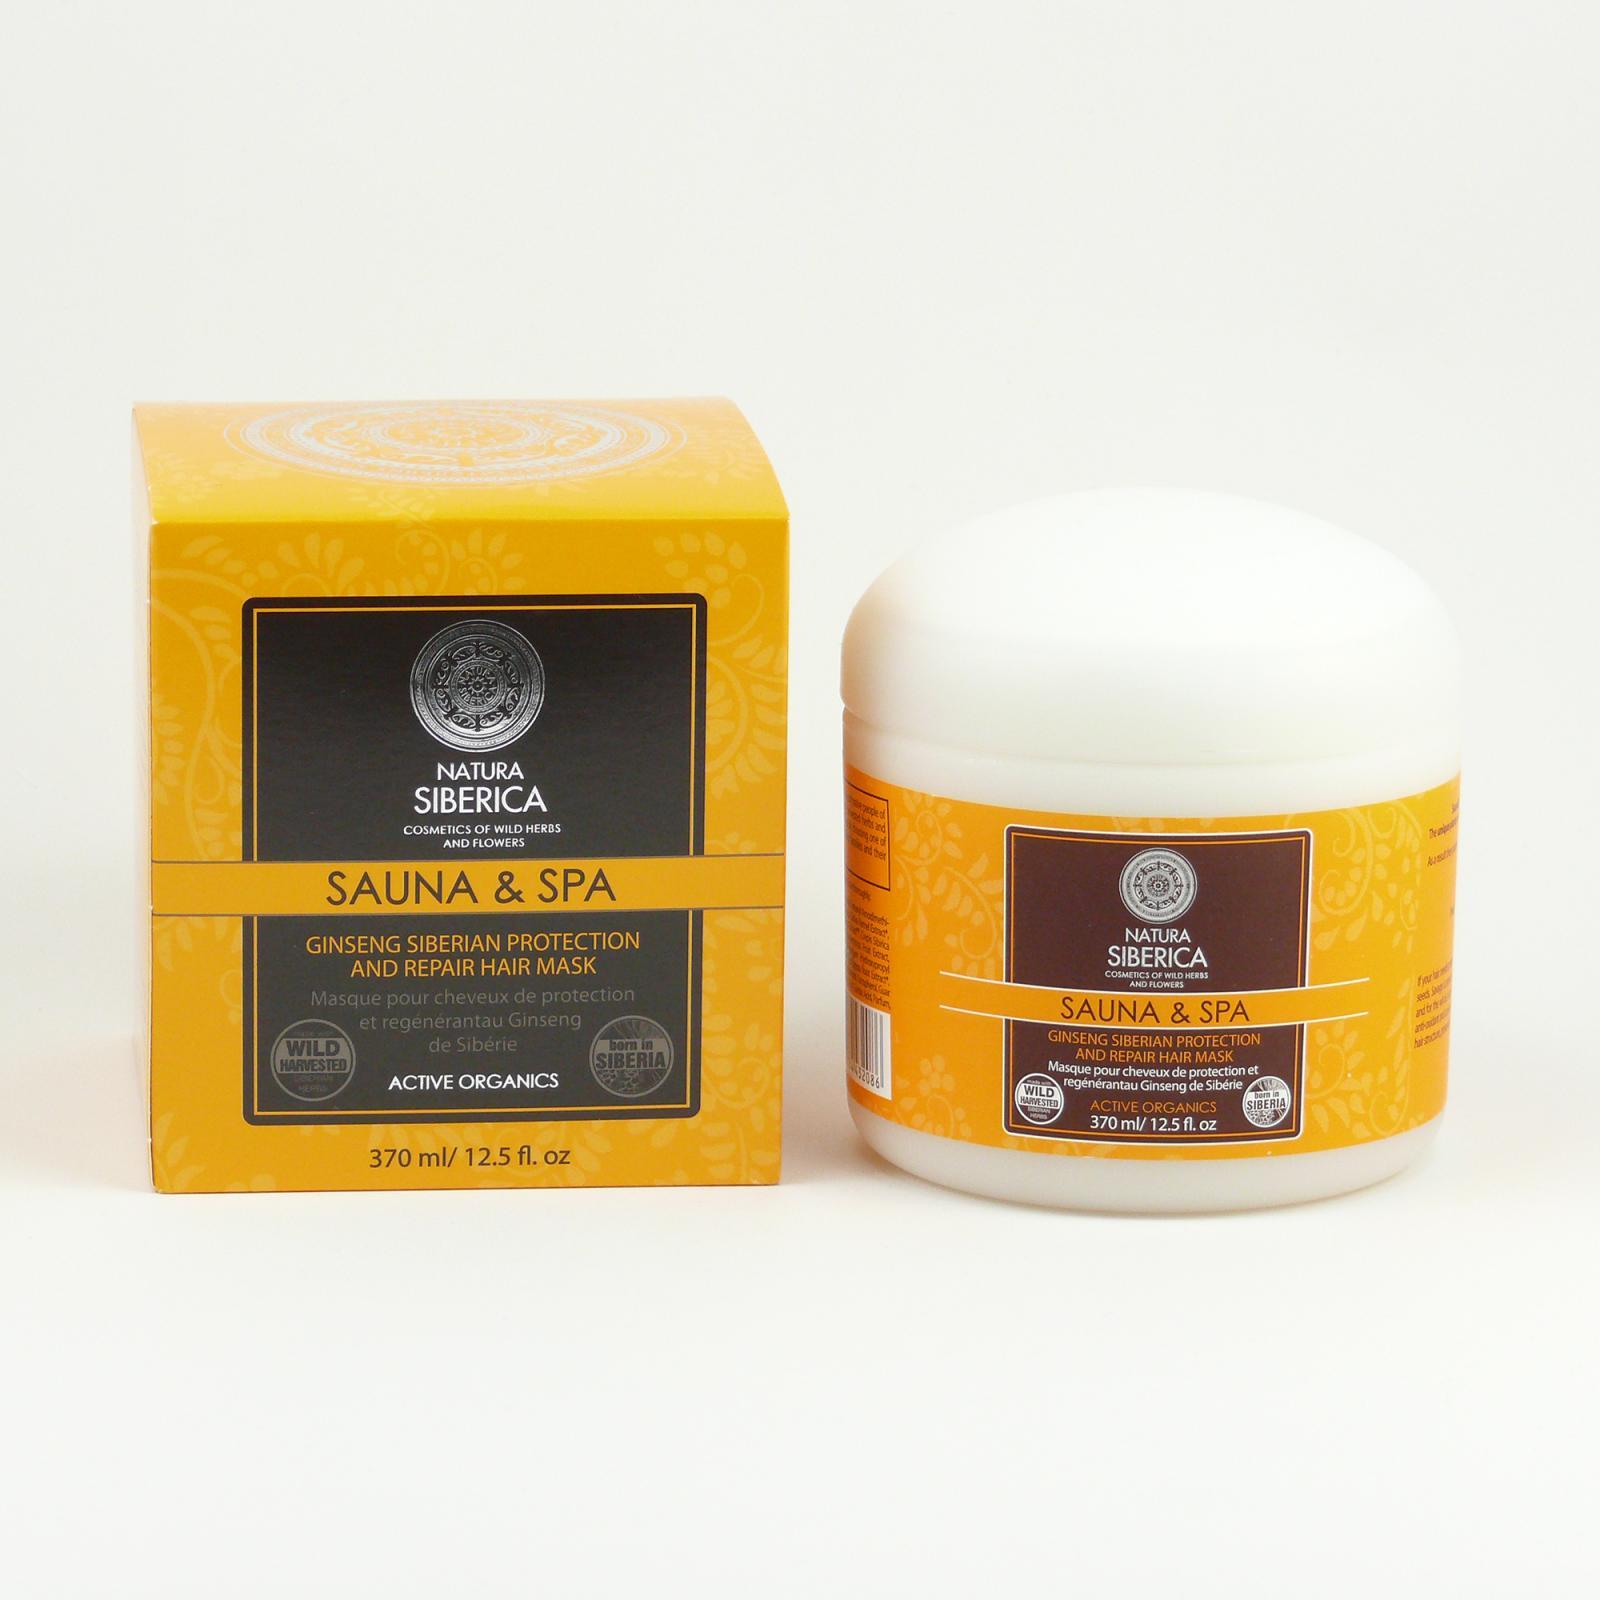 Natura Siberica Maska pro ochranu a regeneraci vlasů 370 ml